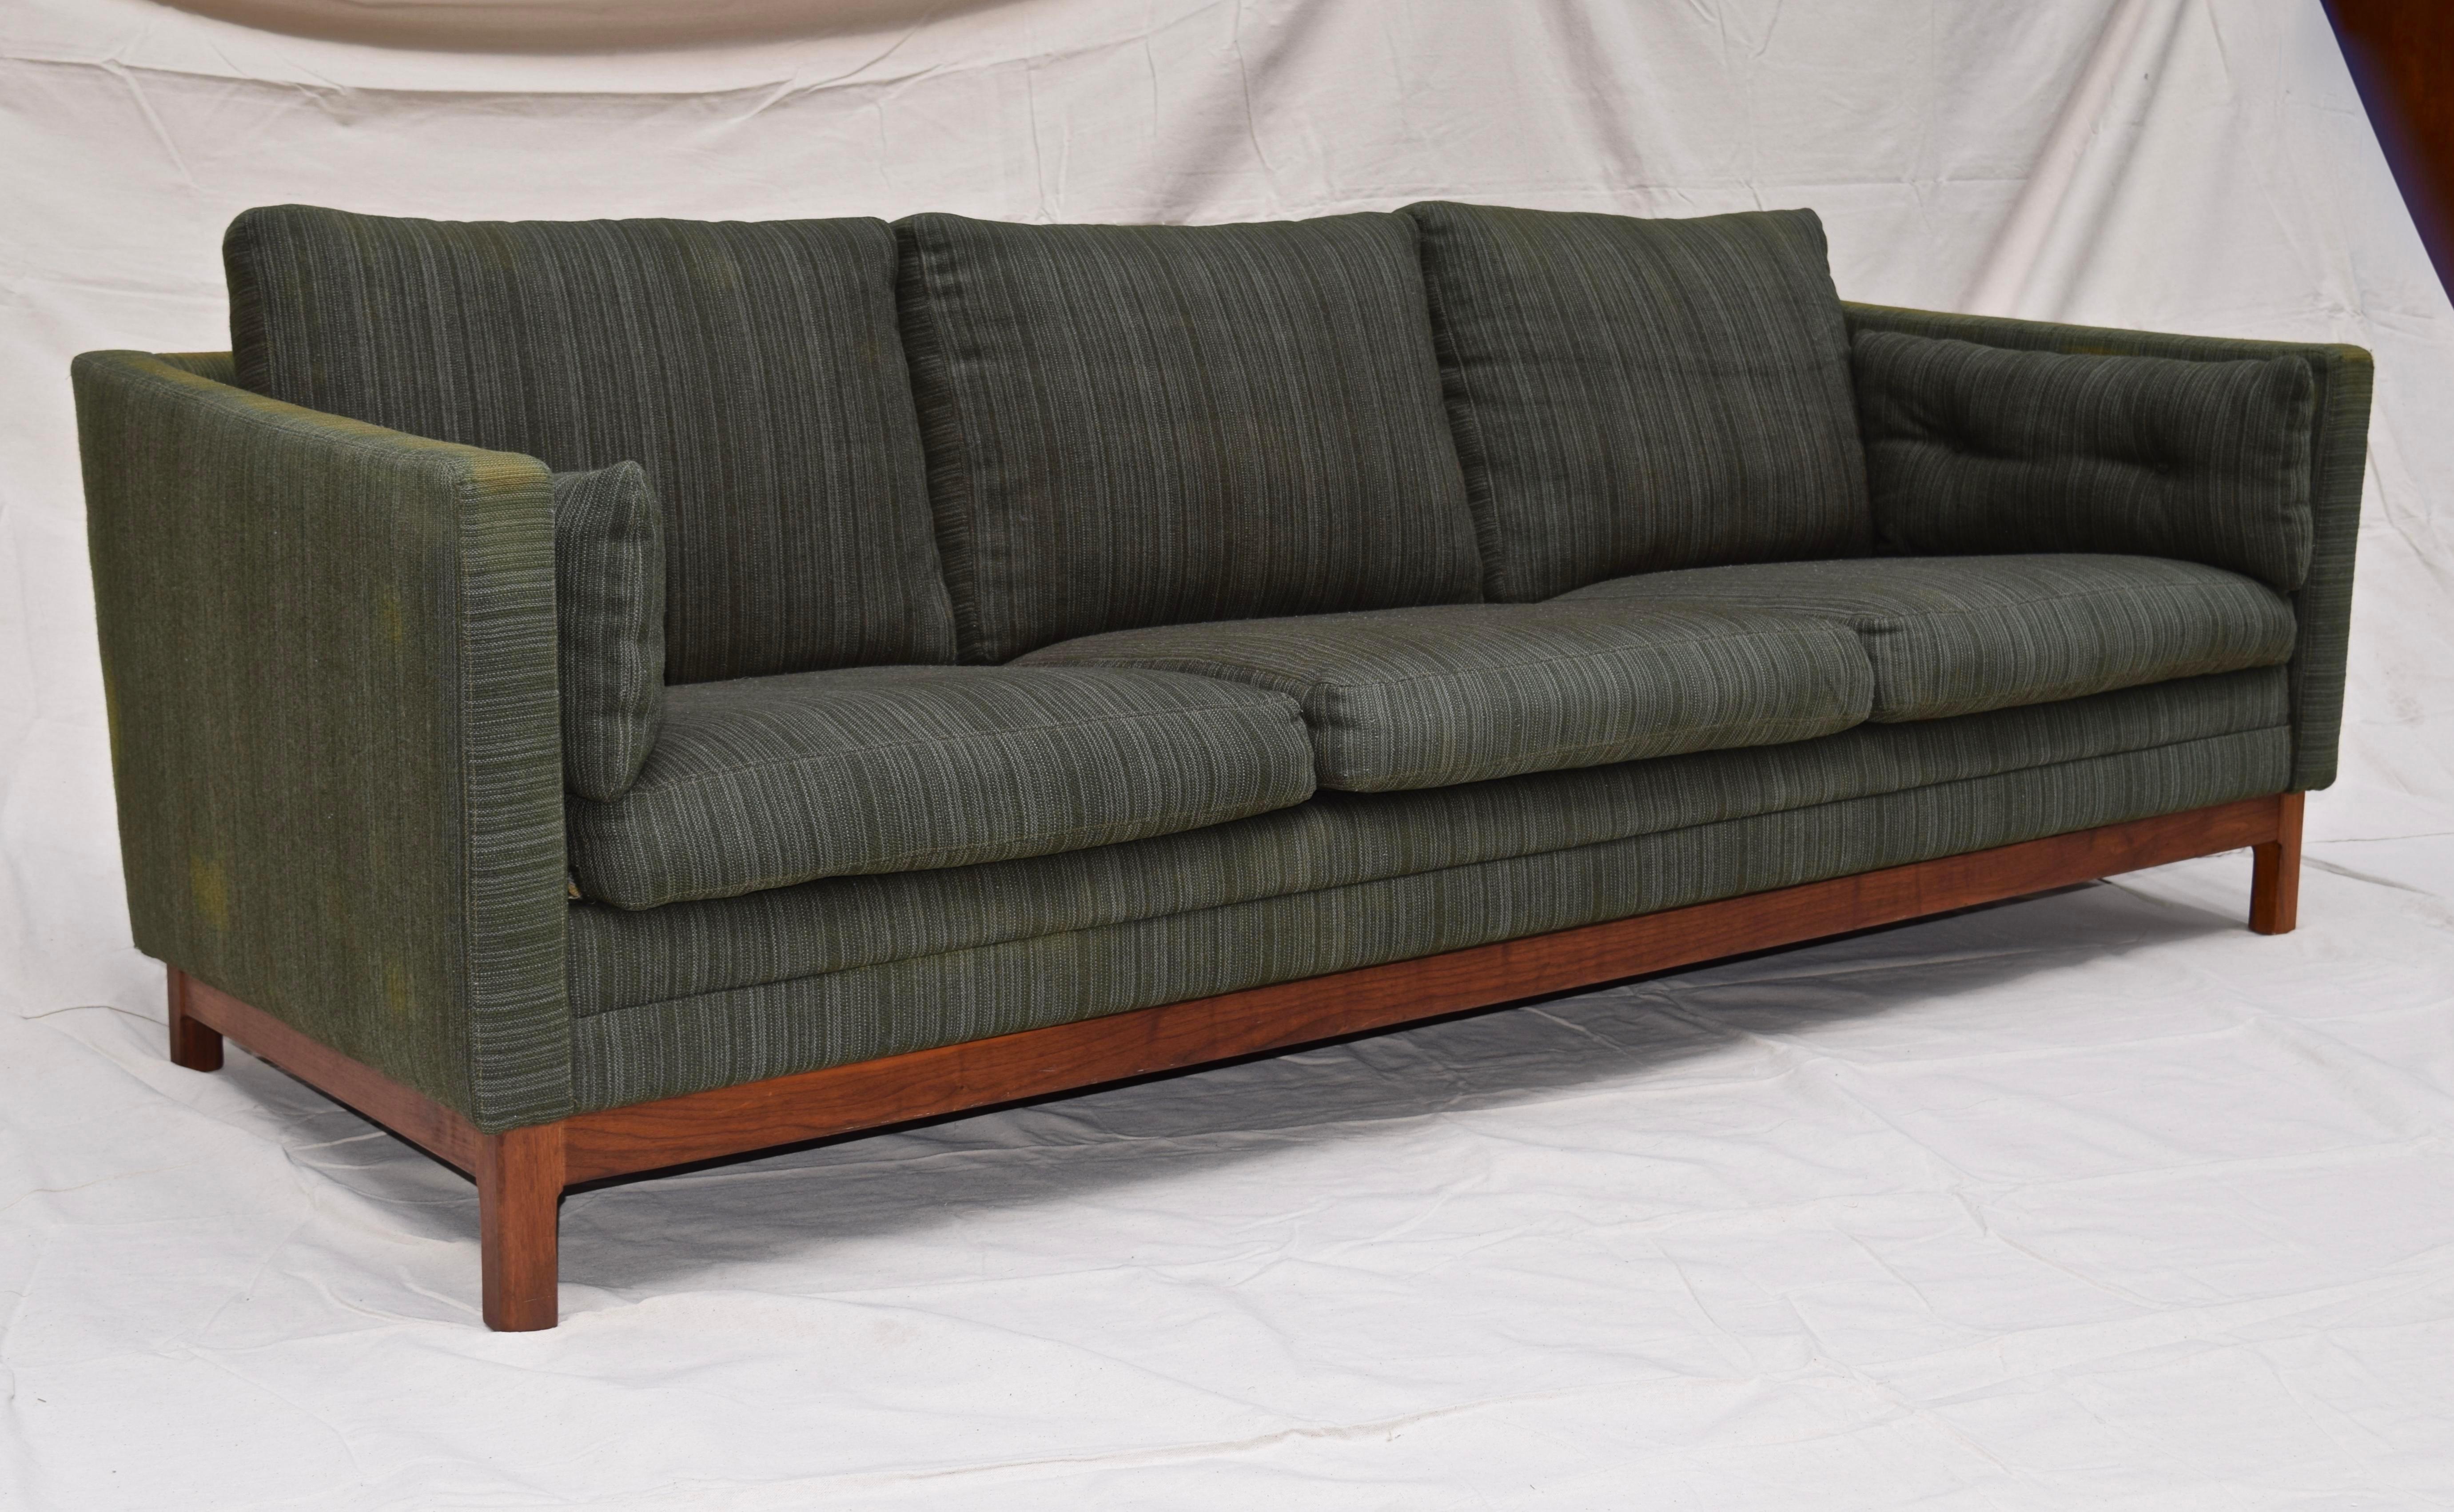 Folke Ohlsson For DUX Pasadena Sofa For Sale   Image 5 Of 11